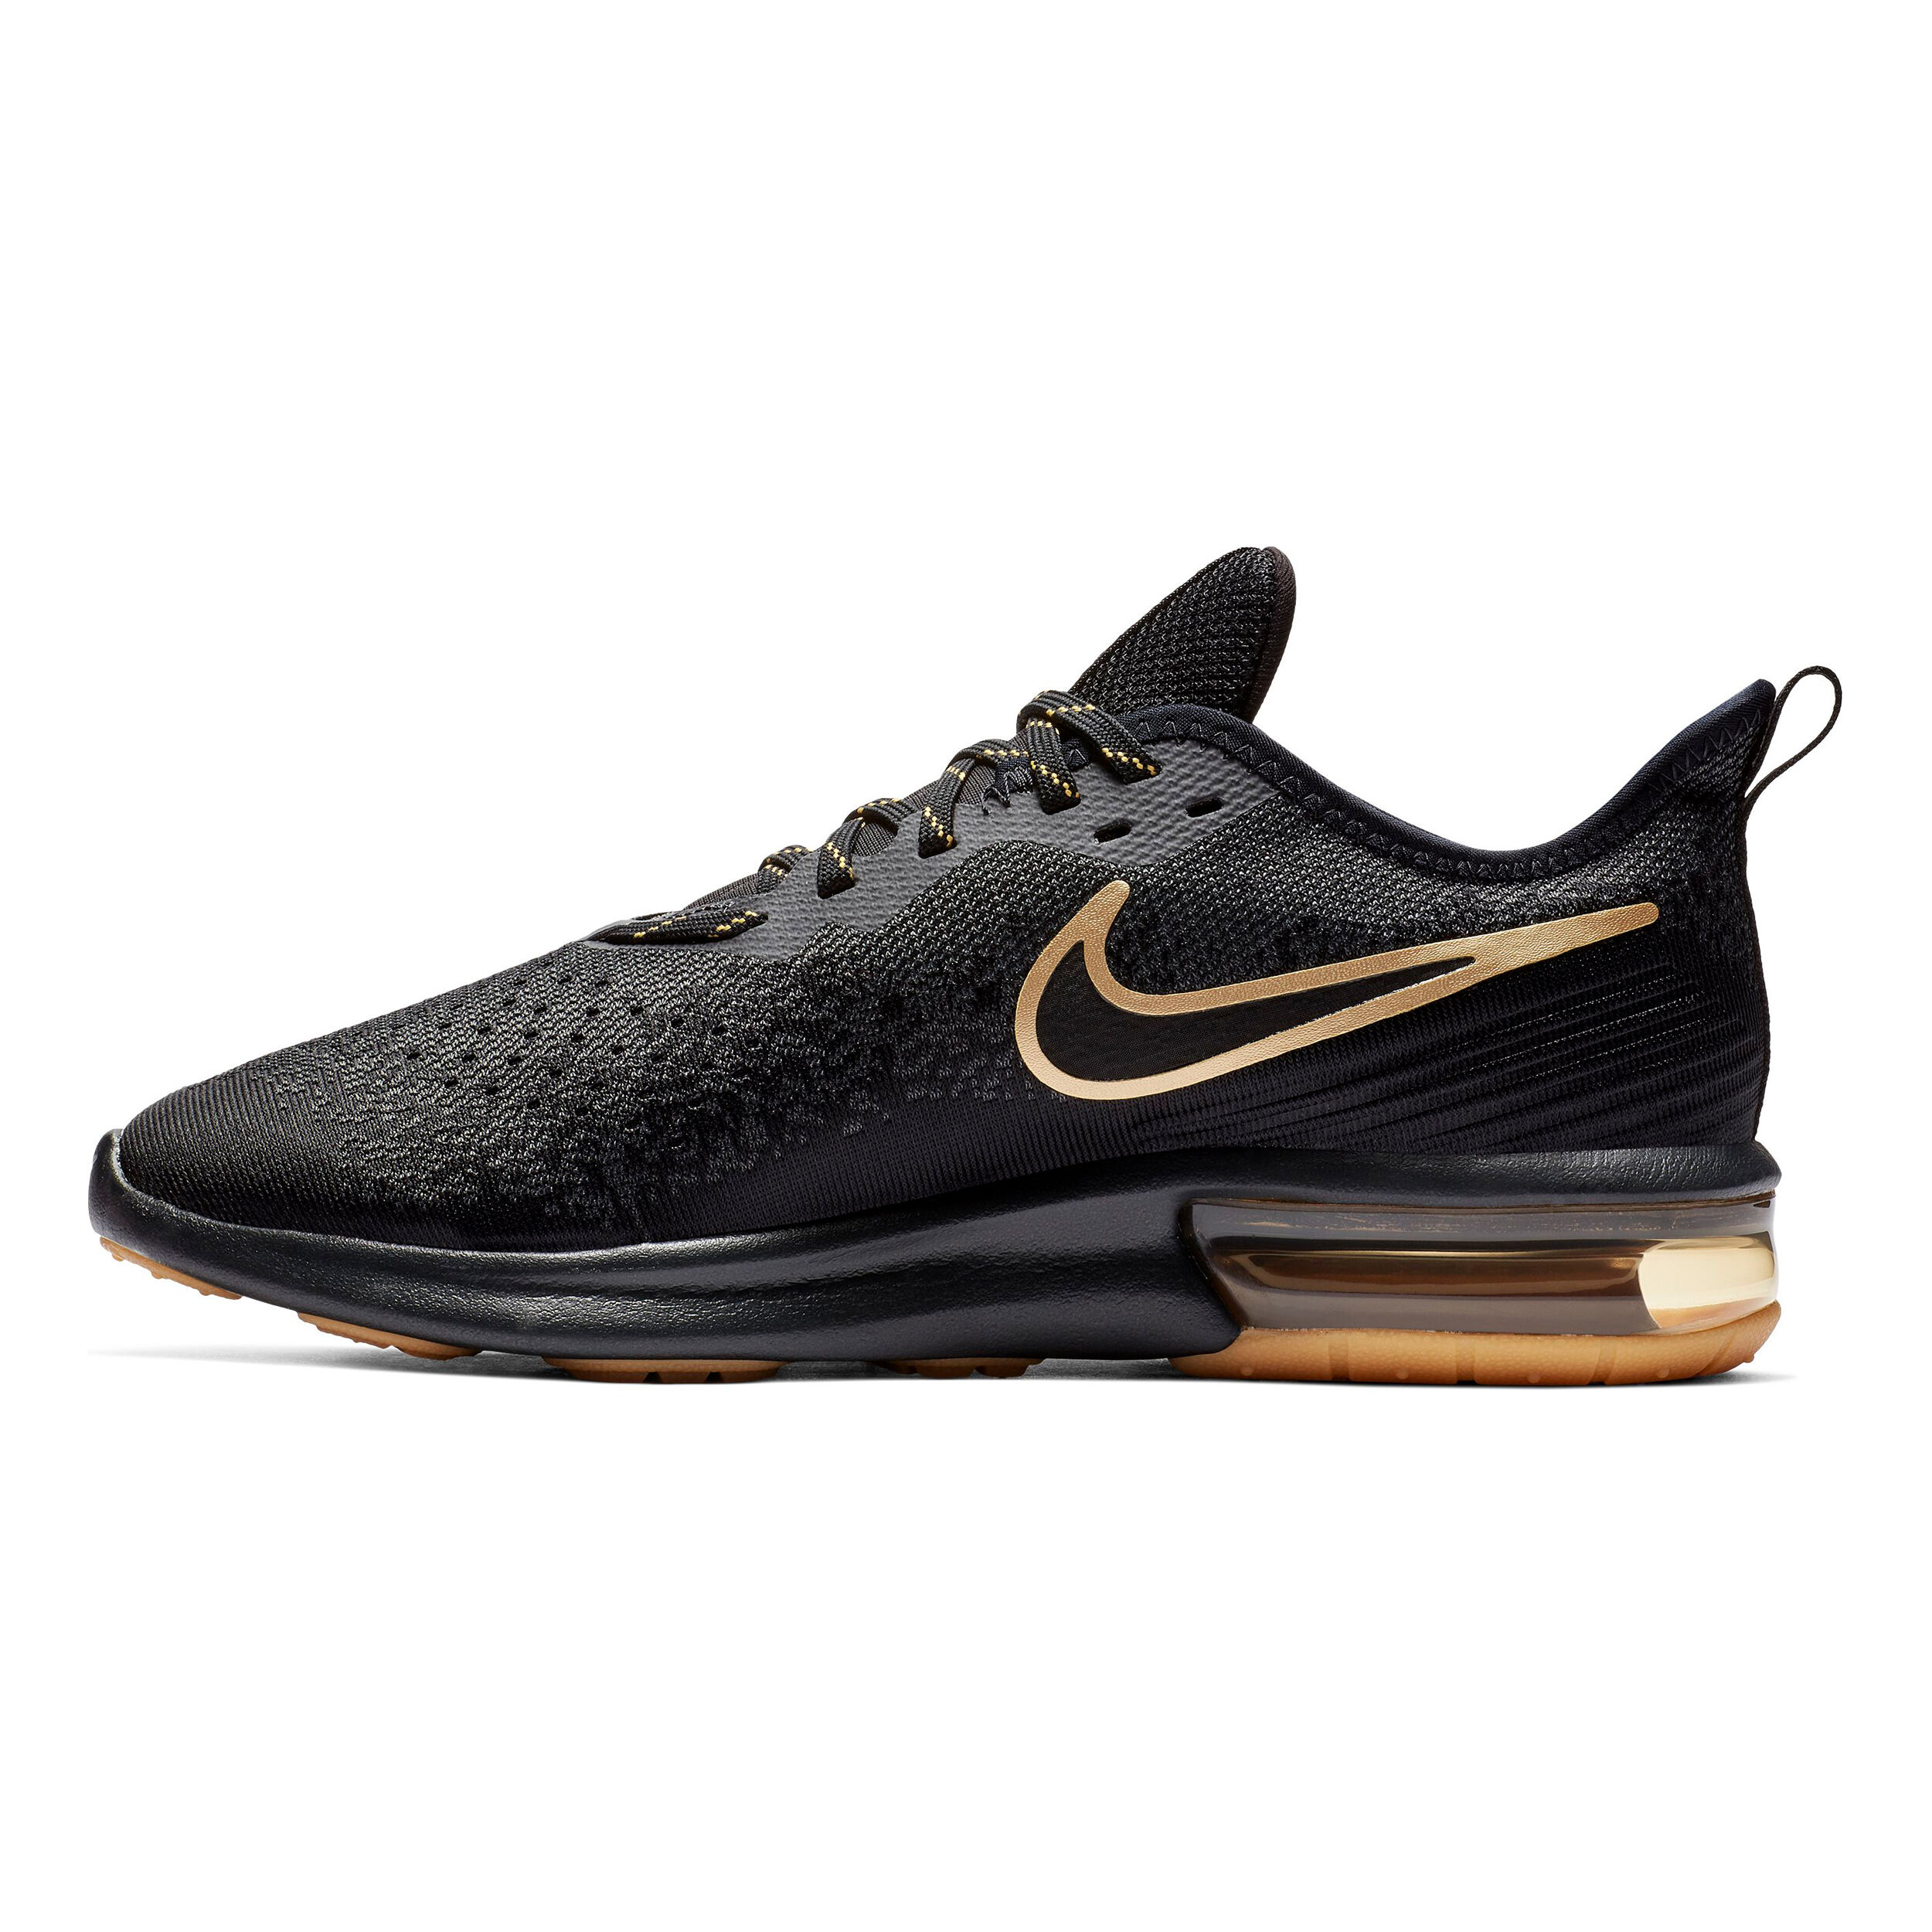 Air Running Max Shoe 4 Nike Men Neutral Sequent BlackGold XPiZOku